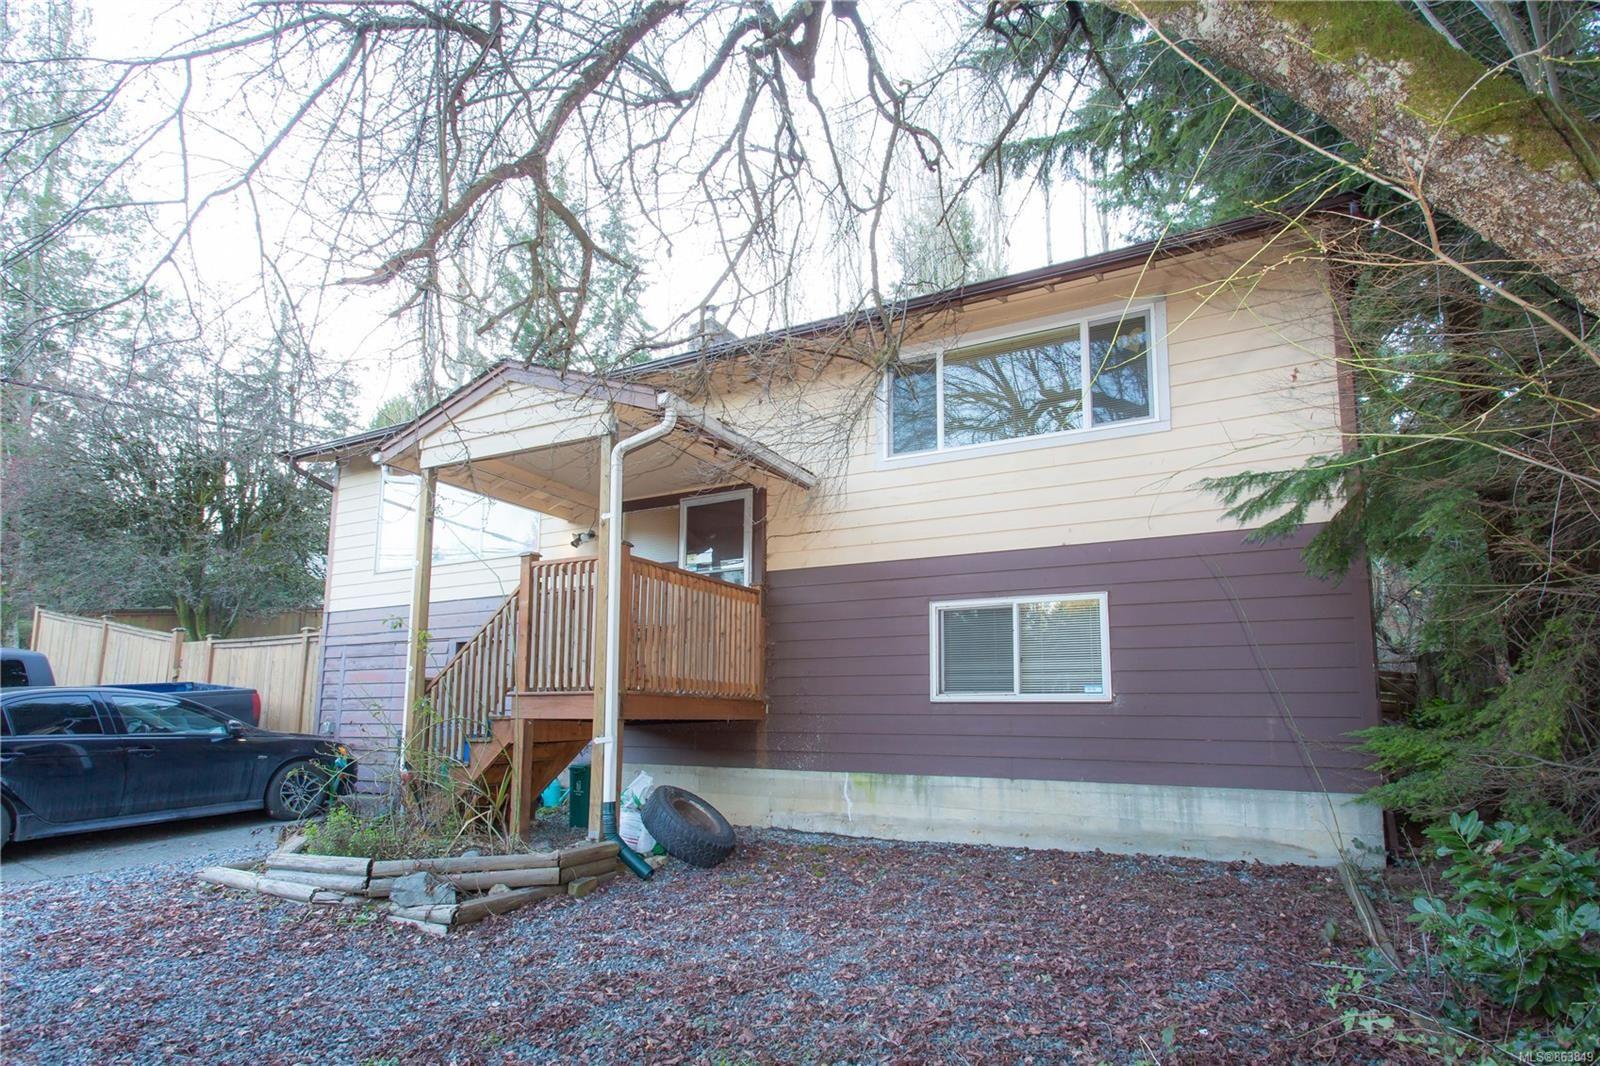 Main Photo: 997 Bruce Ave in : Na South Nanaimo House for sale (Nanaimo)  : MLS®# 863849